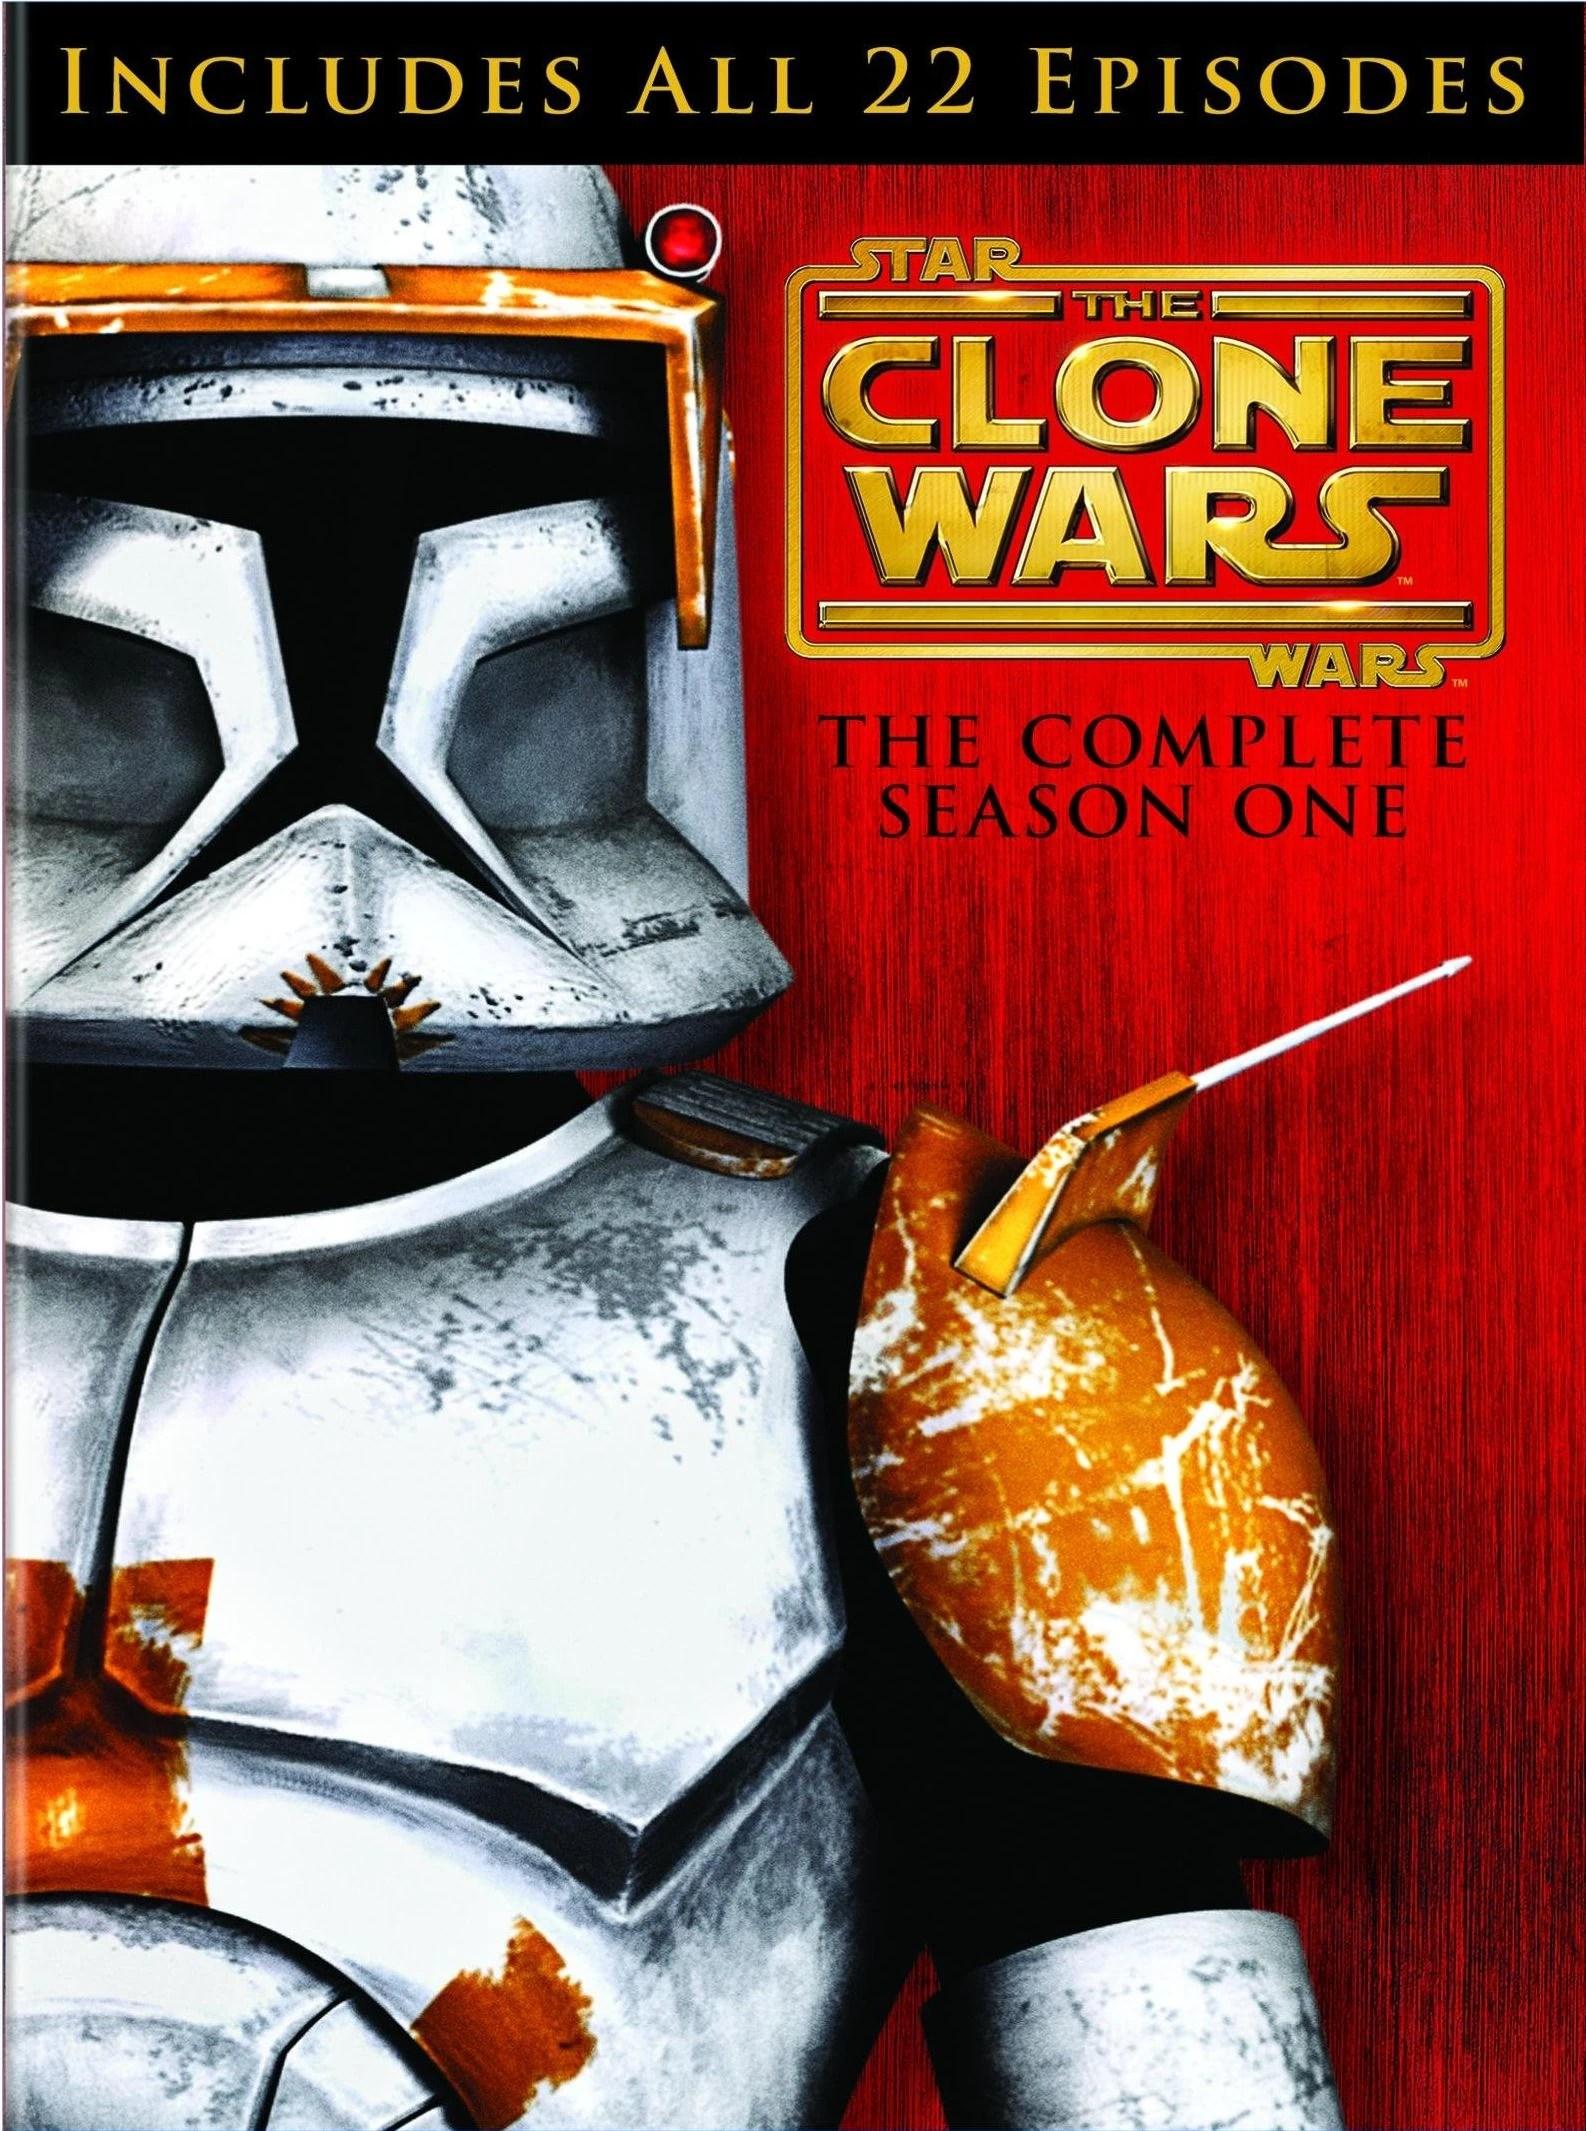 Star Wars The Clone Wars Season 1 | Star Wars Animated ...